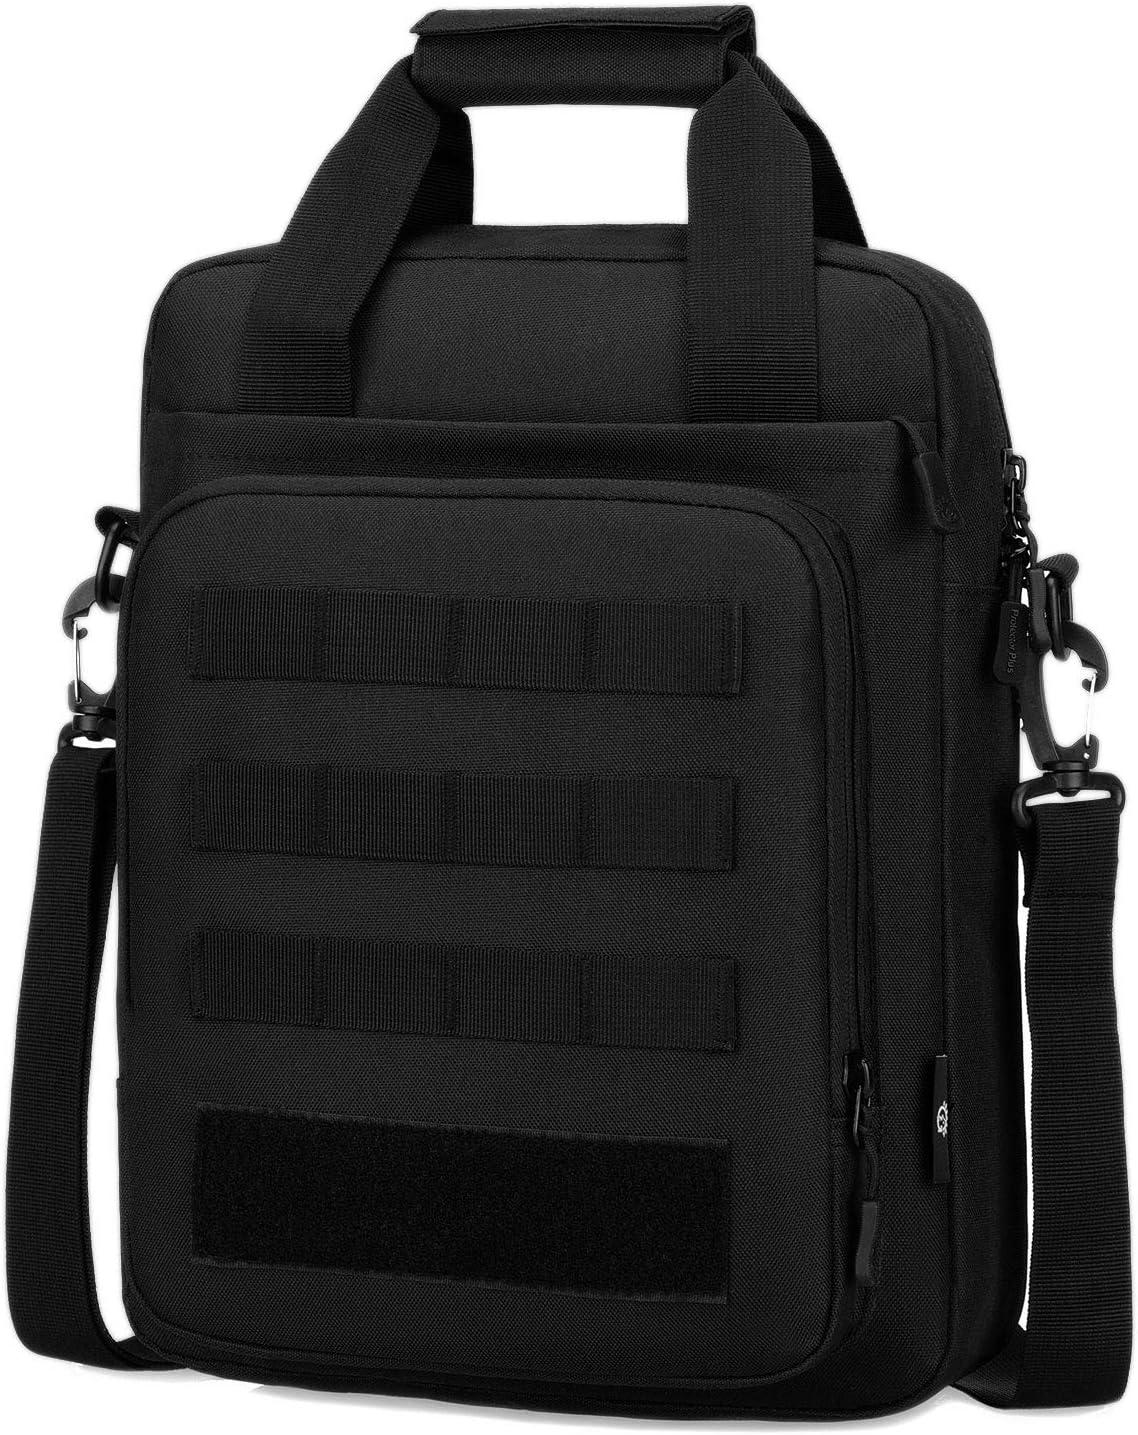 Tactical Briefcase Heavy Duty Military Shoulder Messenger Bag Mens Handbag-Black